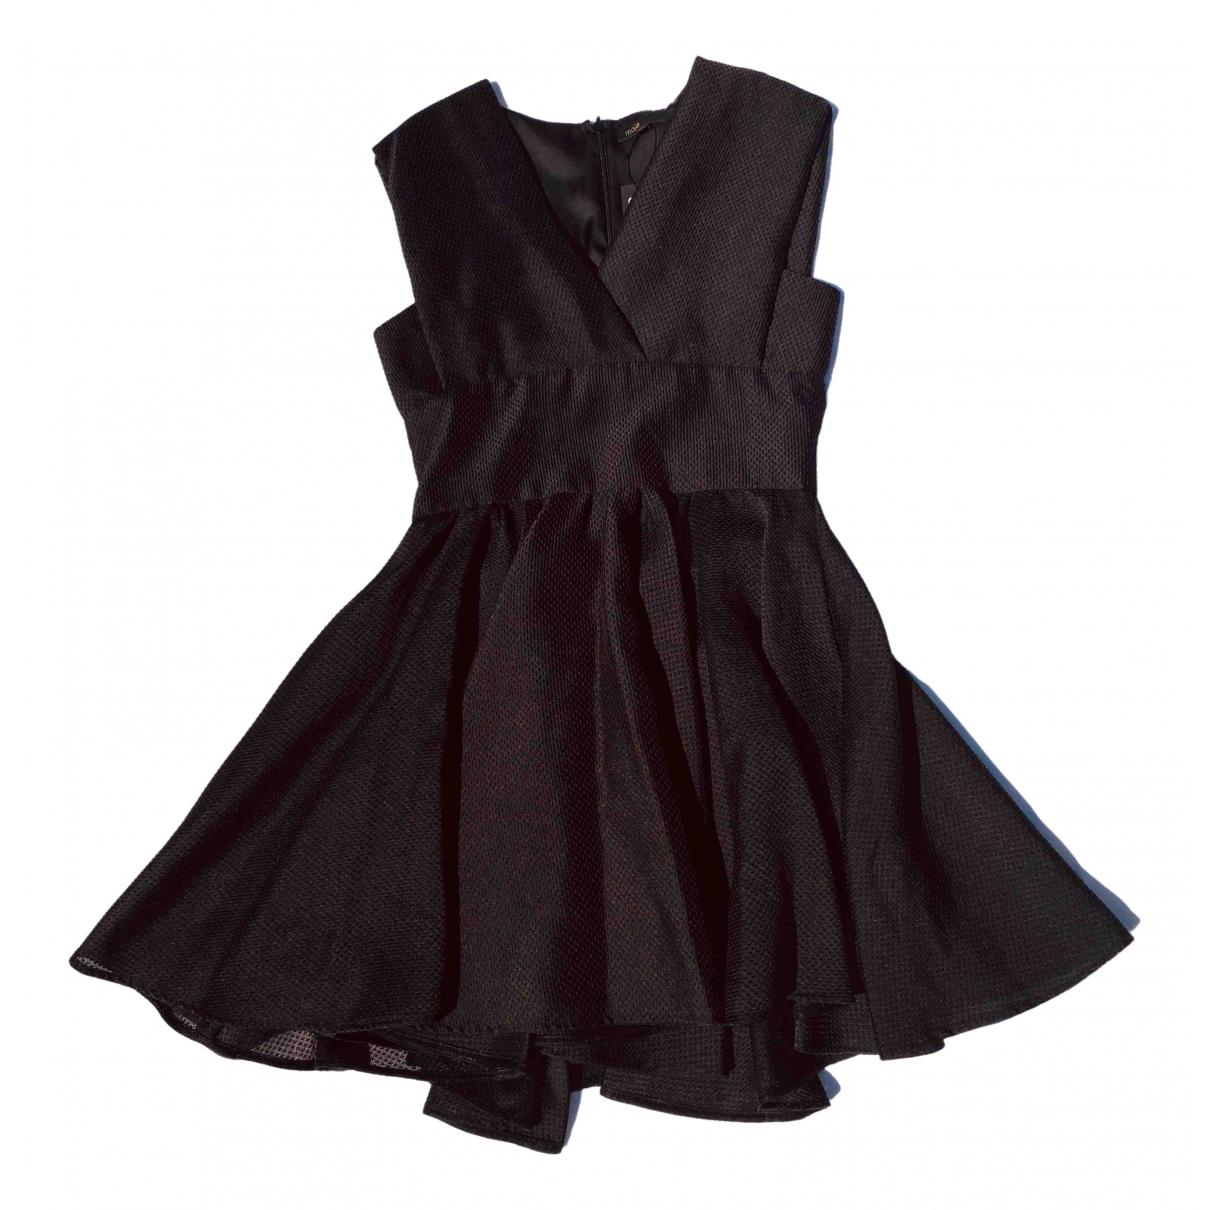 Maje Spring Summer 2019 Black Denim - Jeans dress for Women 40 FR